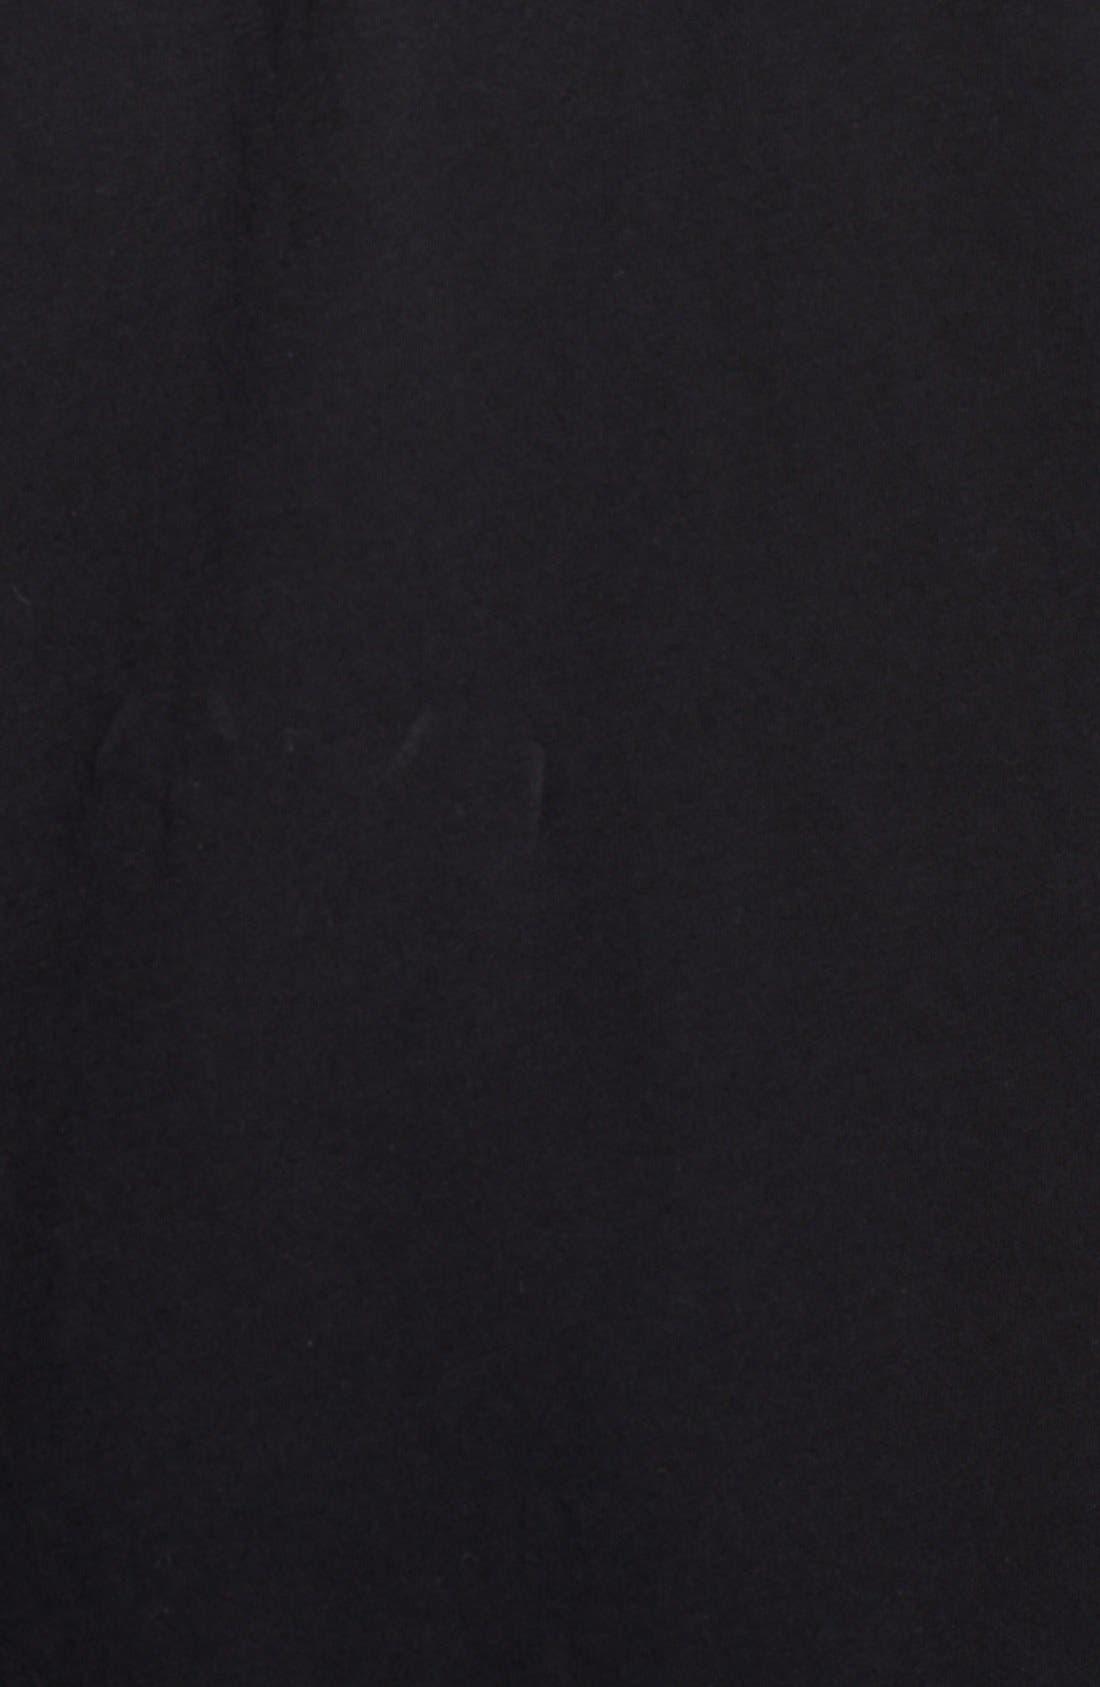 Alternate Image 3  - A.L.C. 'Tenorio' Short Sleeve Tee